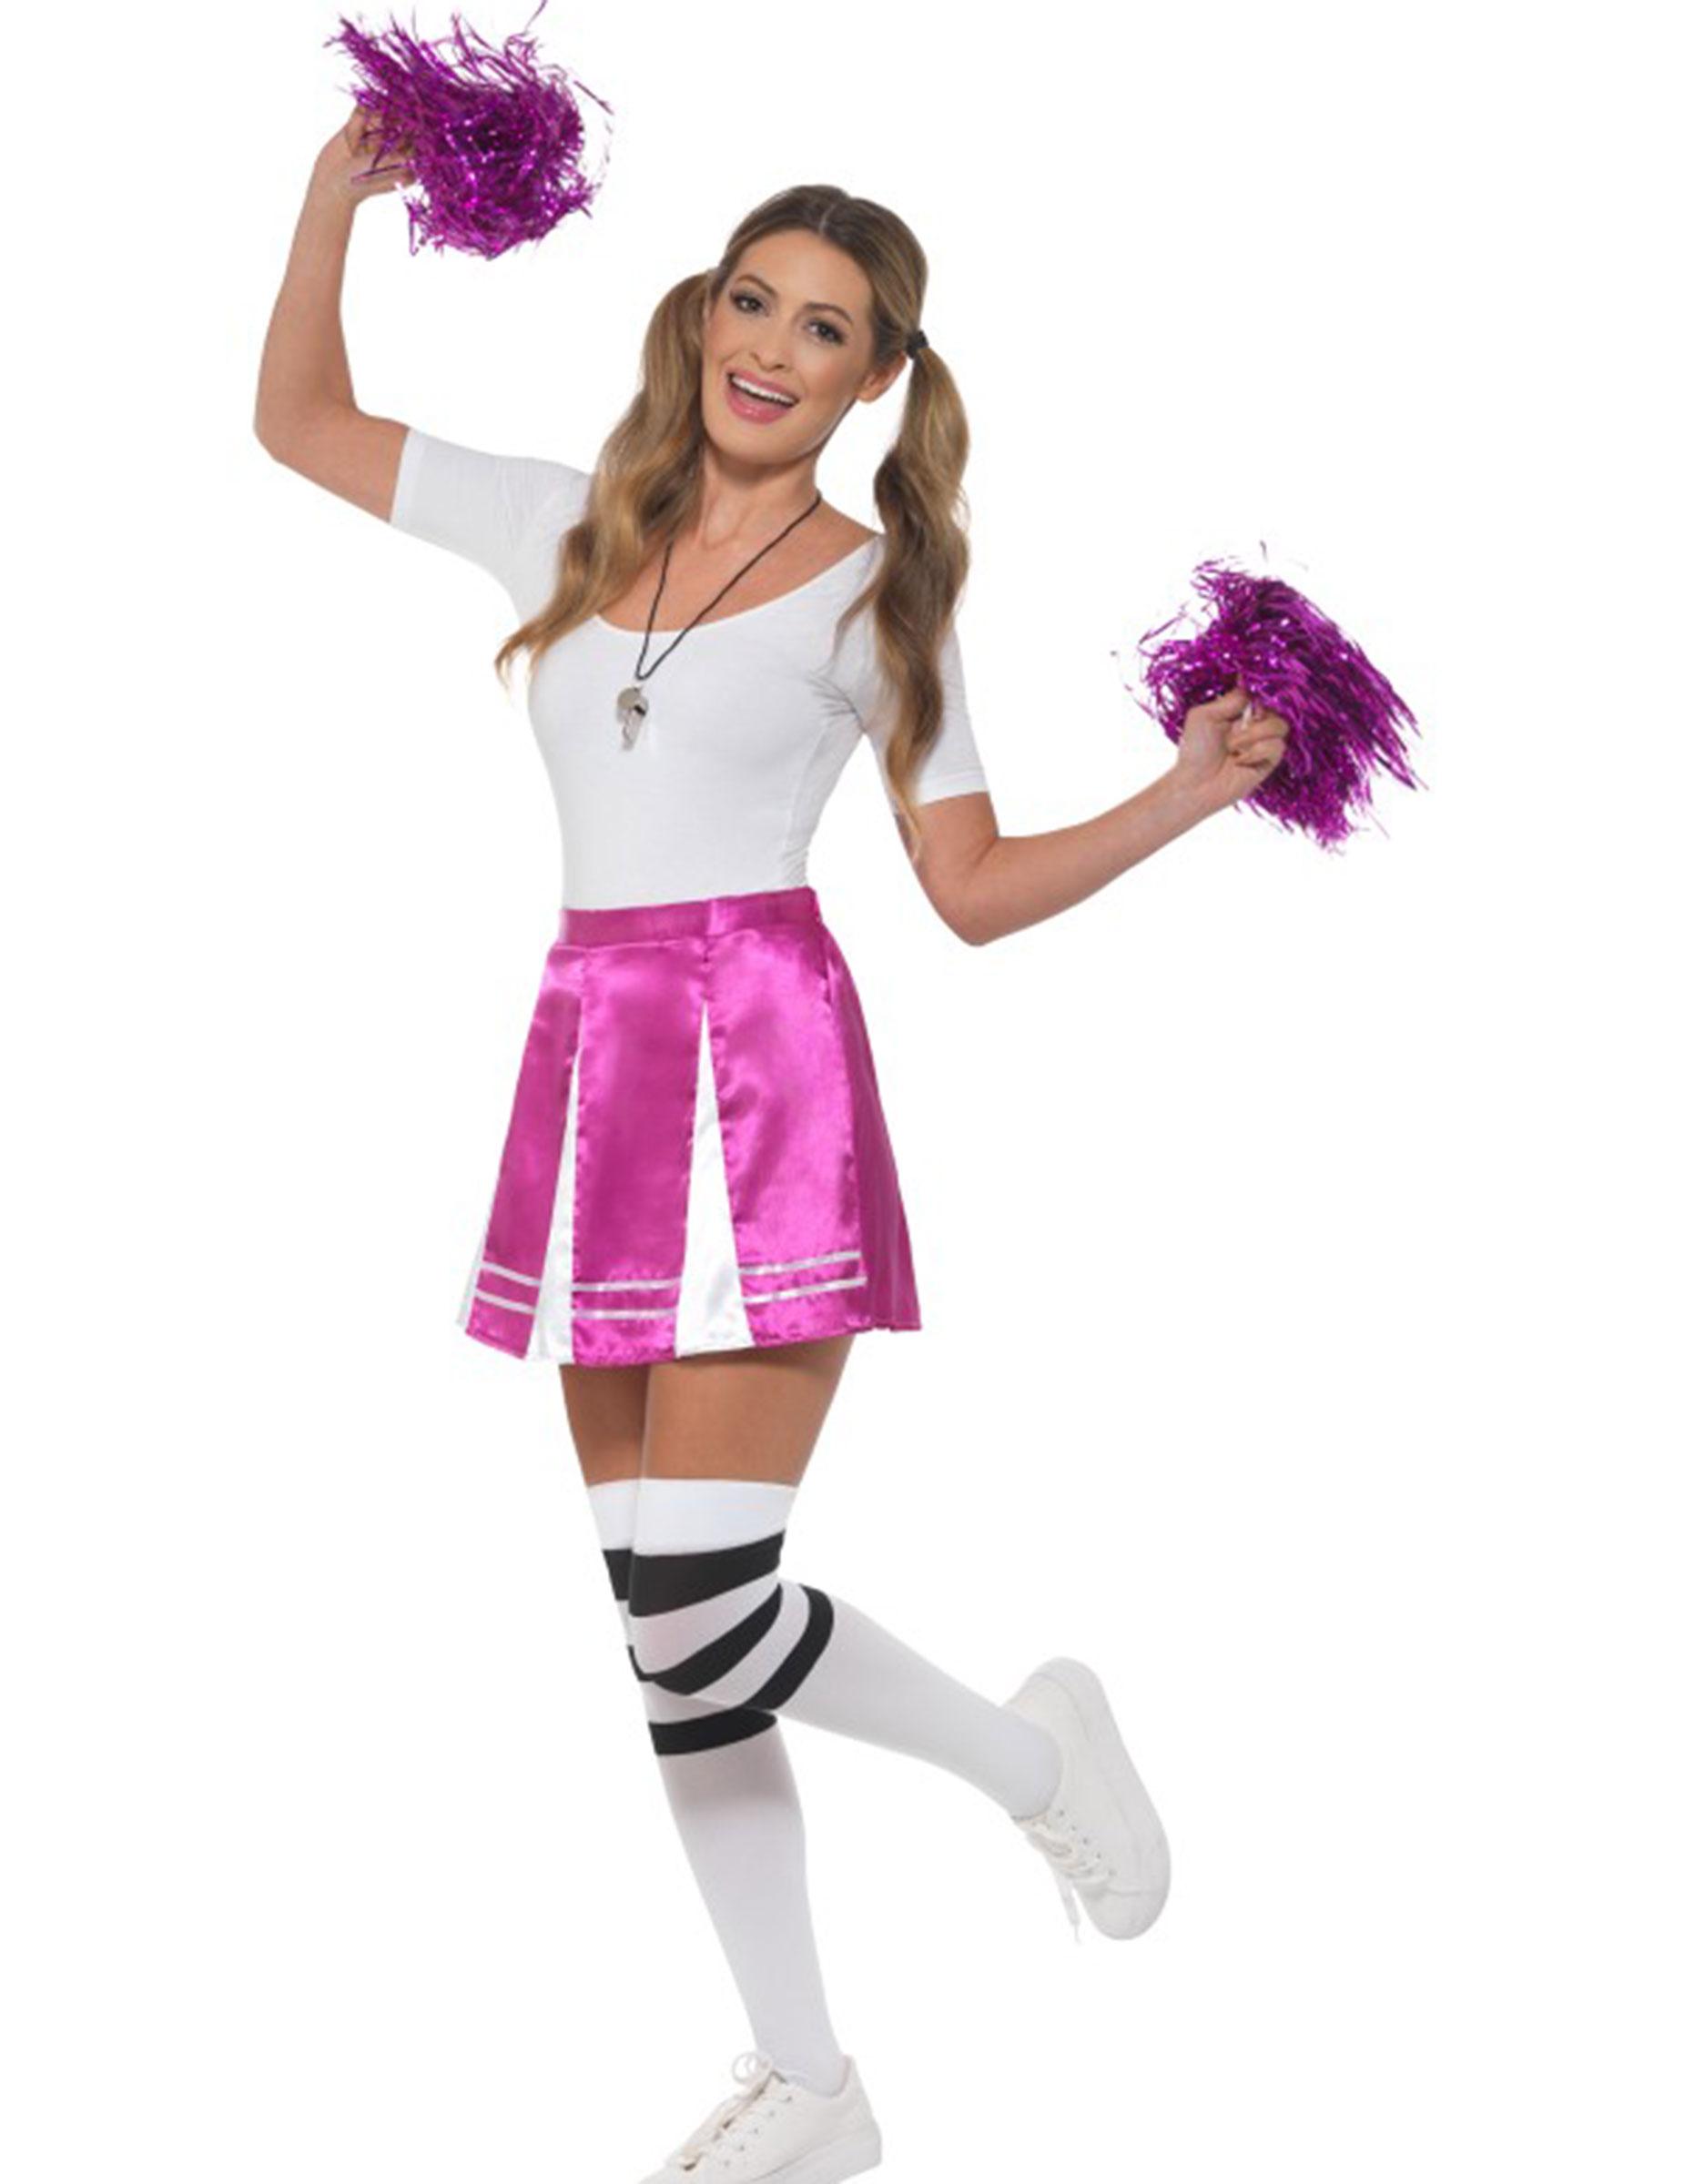 Fasching Kostume Cheerleader Usa Cheerleader Kleid Lila Gelb